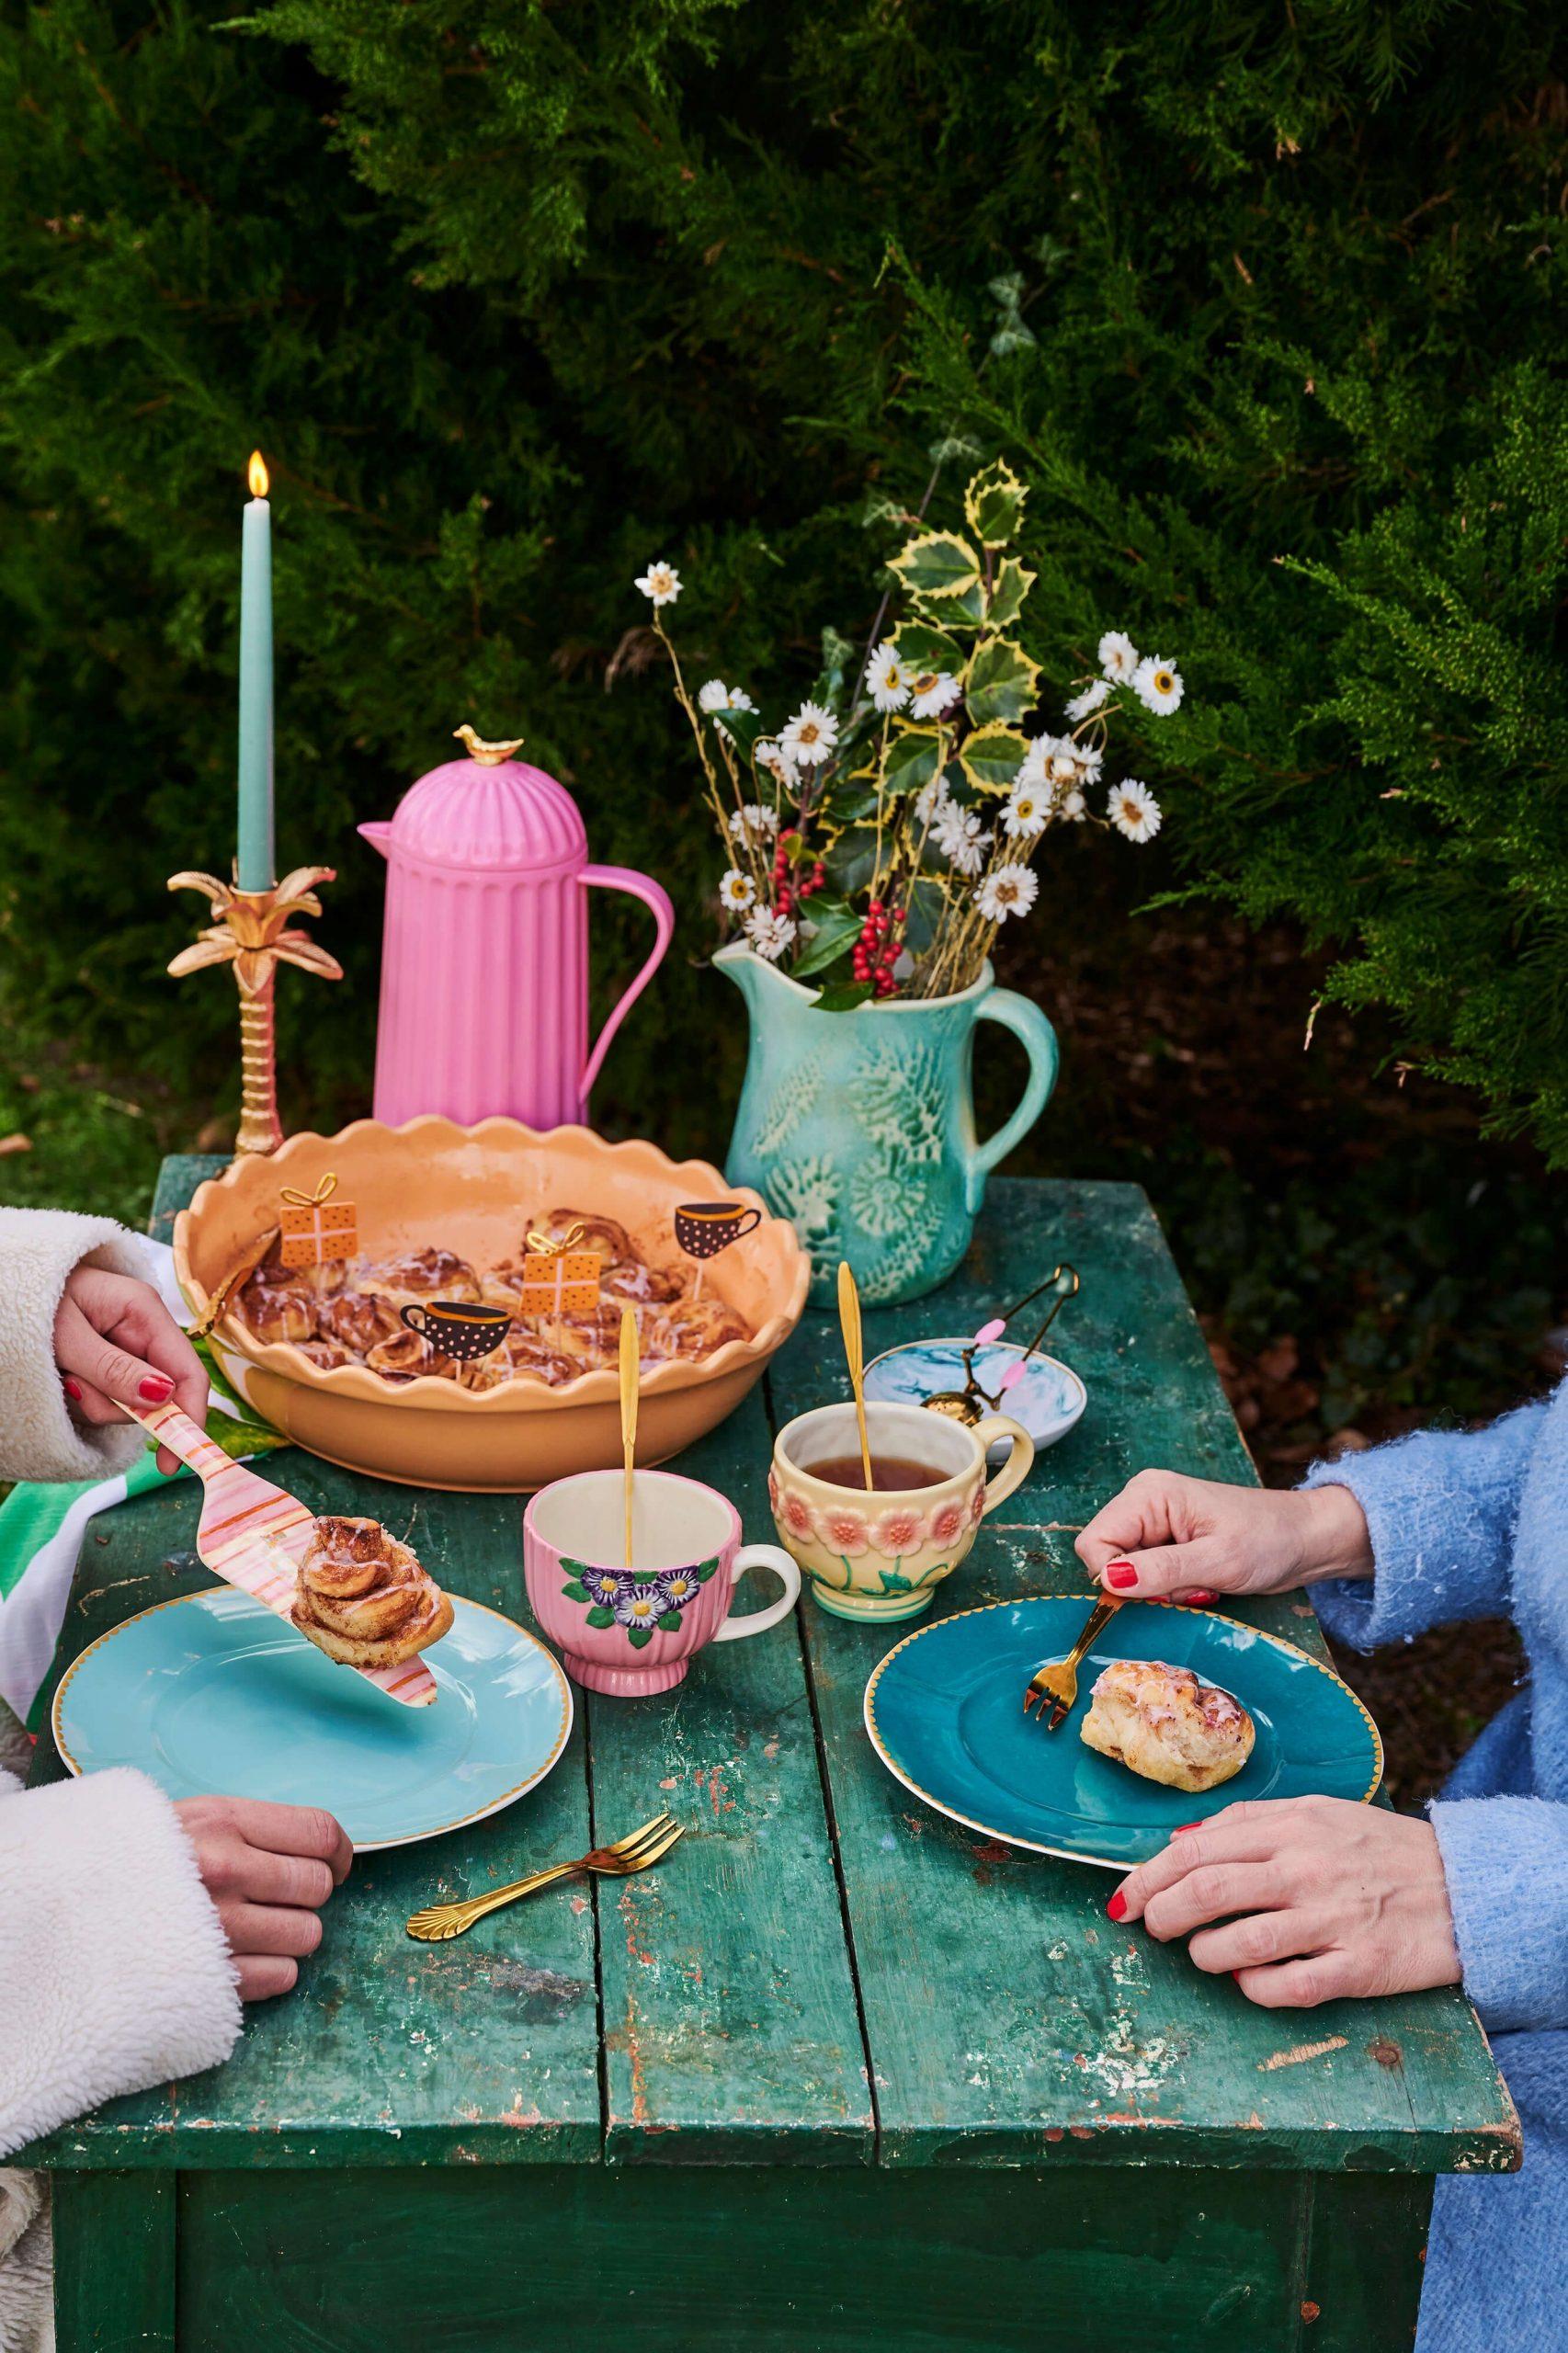 ENJOY's FAVORITES: RICE DK ovenschalen | ENJOY! The Good Life